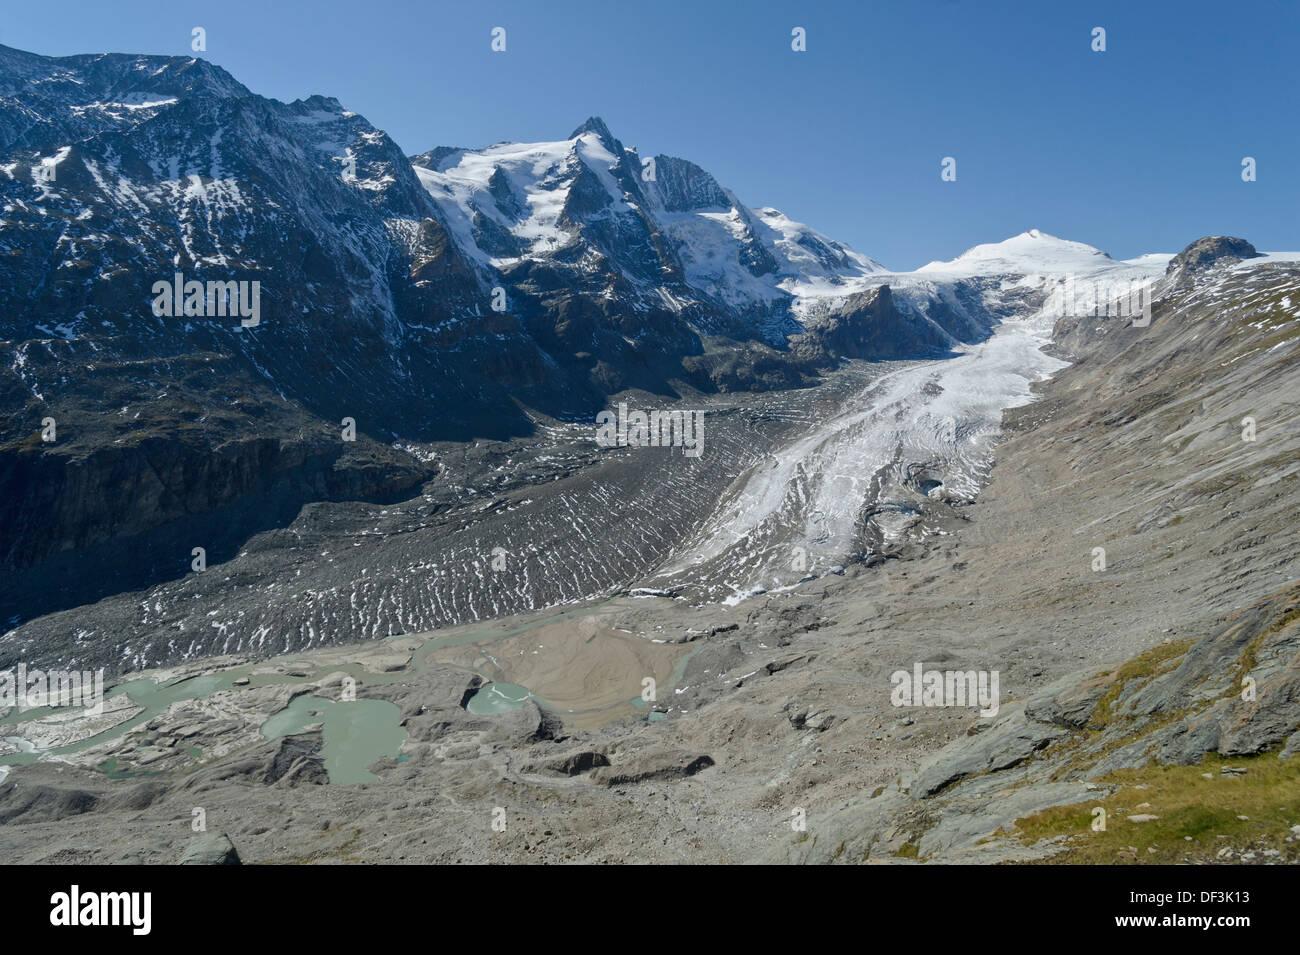 Austria / Hohe Tauern National Park - Impacts of Climate Change: glacier melting. Pasterze glacier beneath Mount Grossglockner. - Stock Image